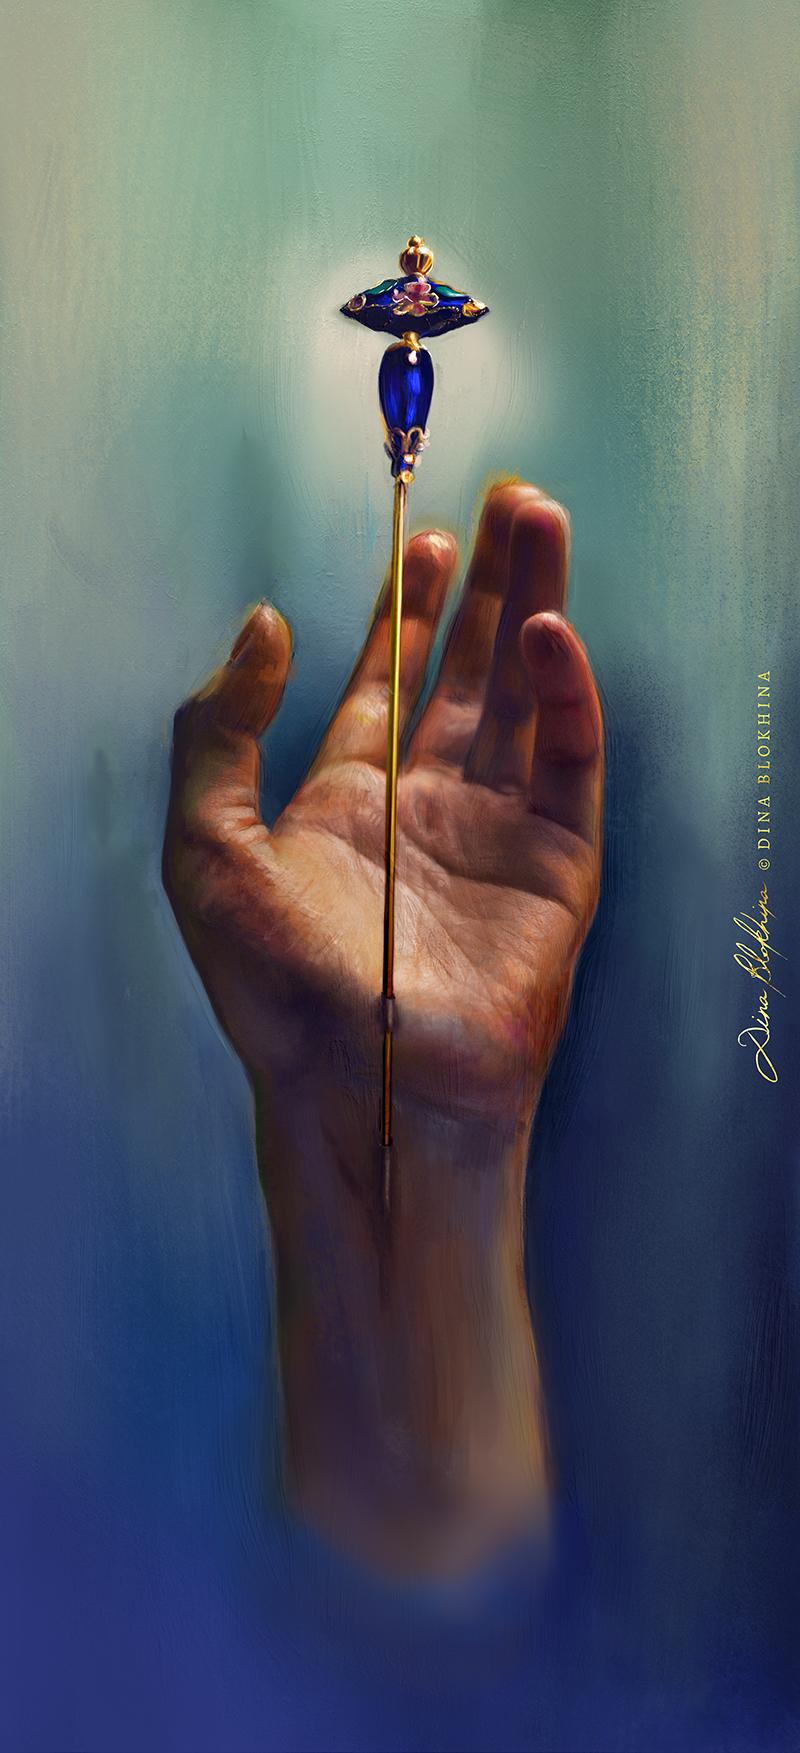 Artist's Prayer - Dina Blokhina